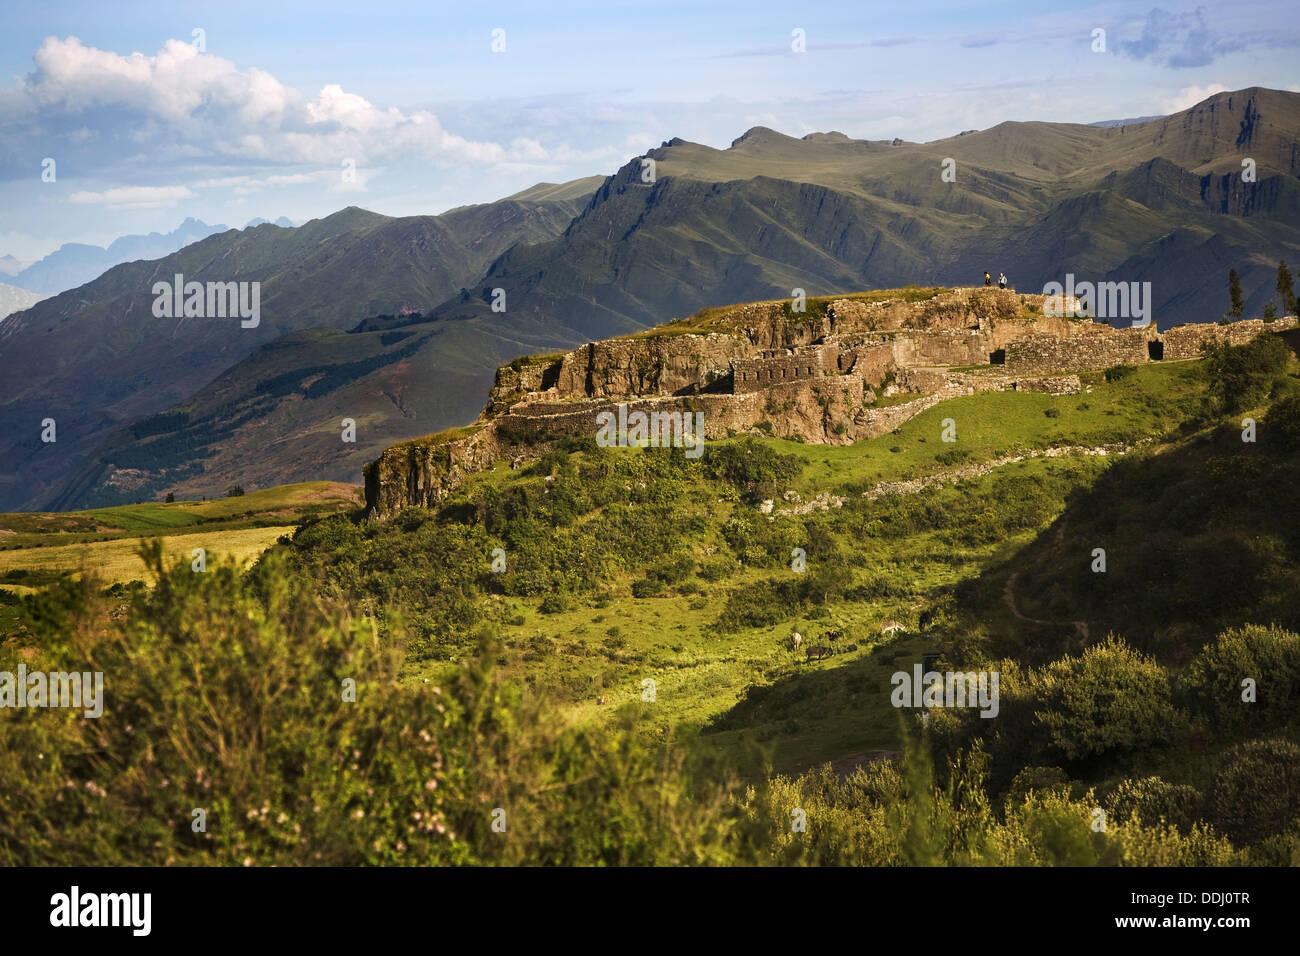 Pucapucara Incan military complex, Cusco region, Peru - Stock Image